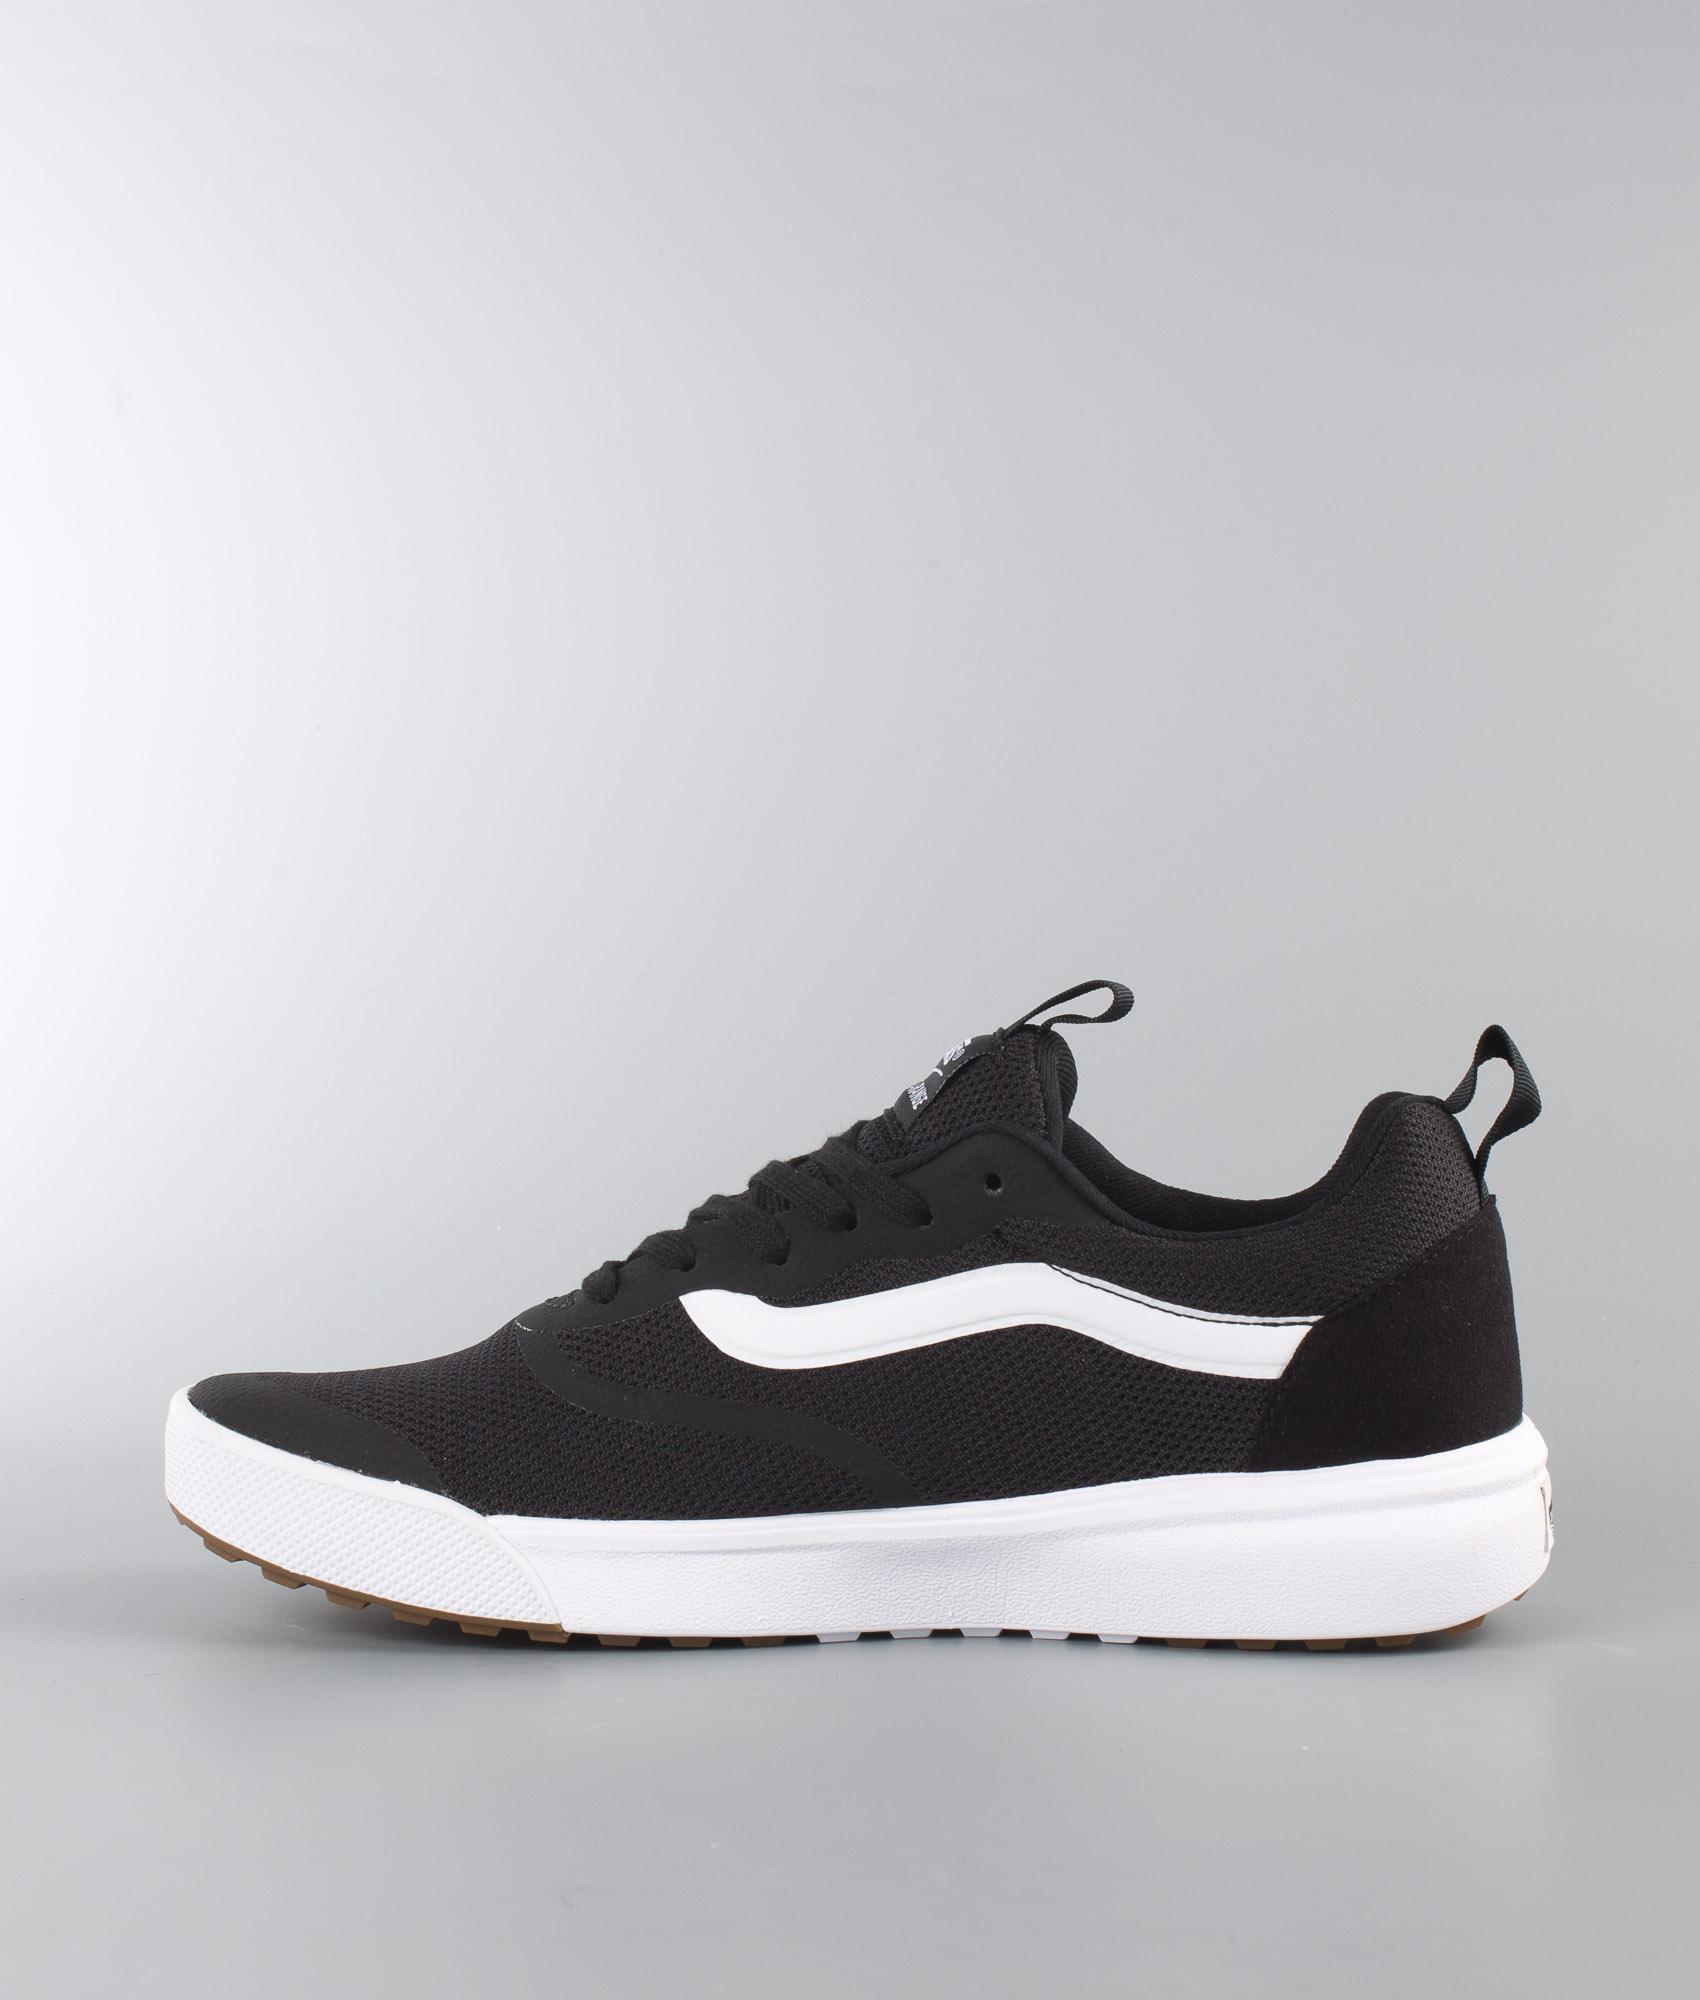 Rapidweld Blackwhite Ultrarange Chaussures Ultrarange Vans Rapidweld Vans FTl1cKJ